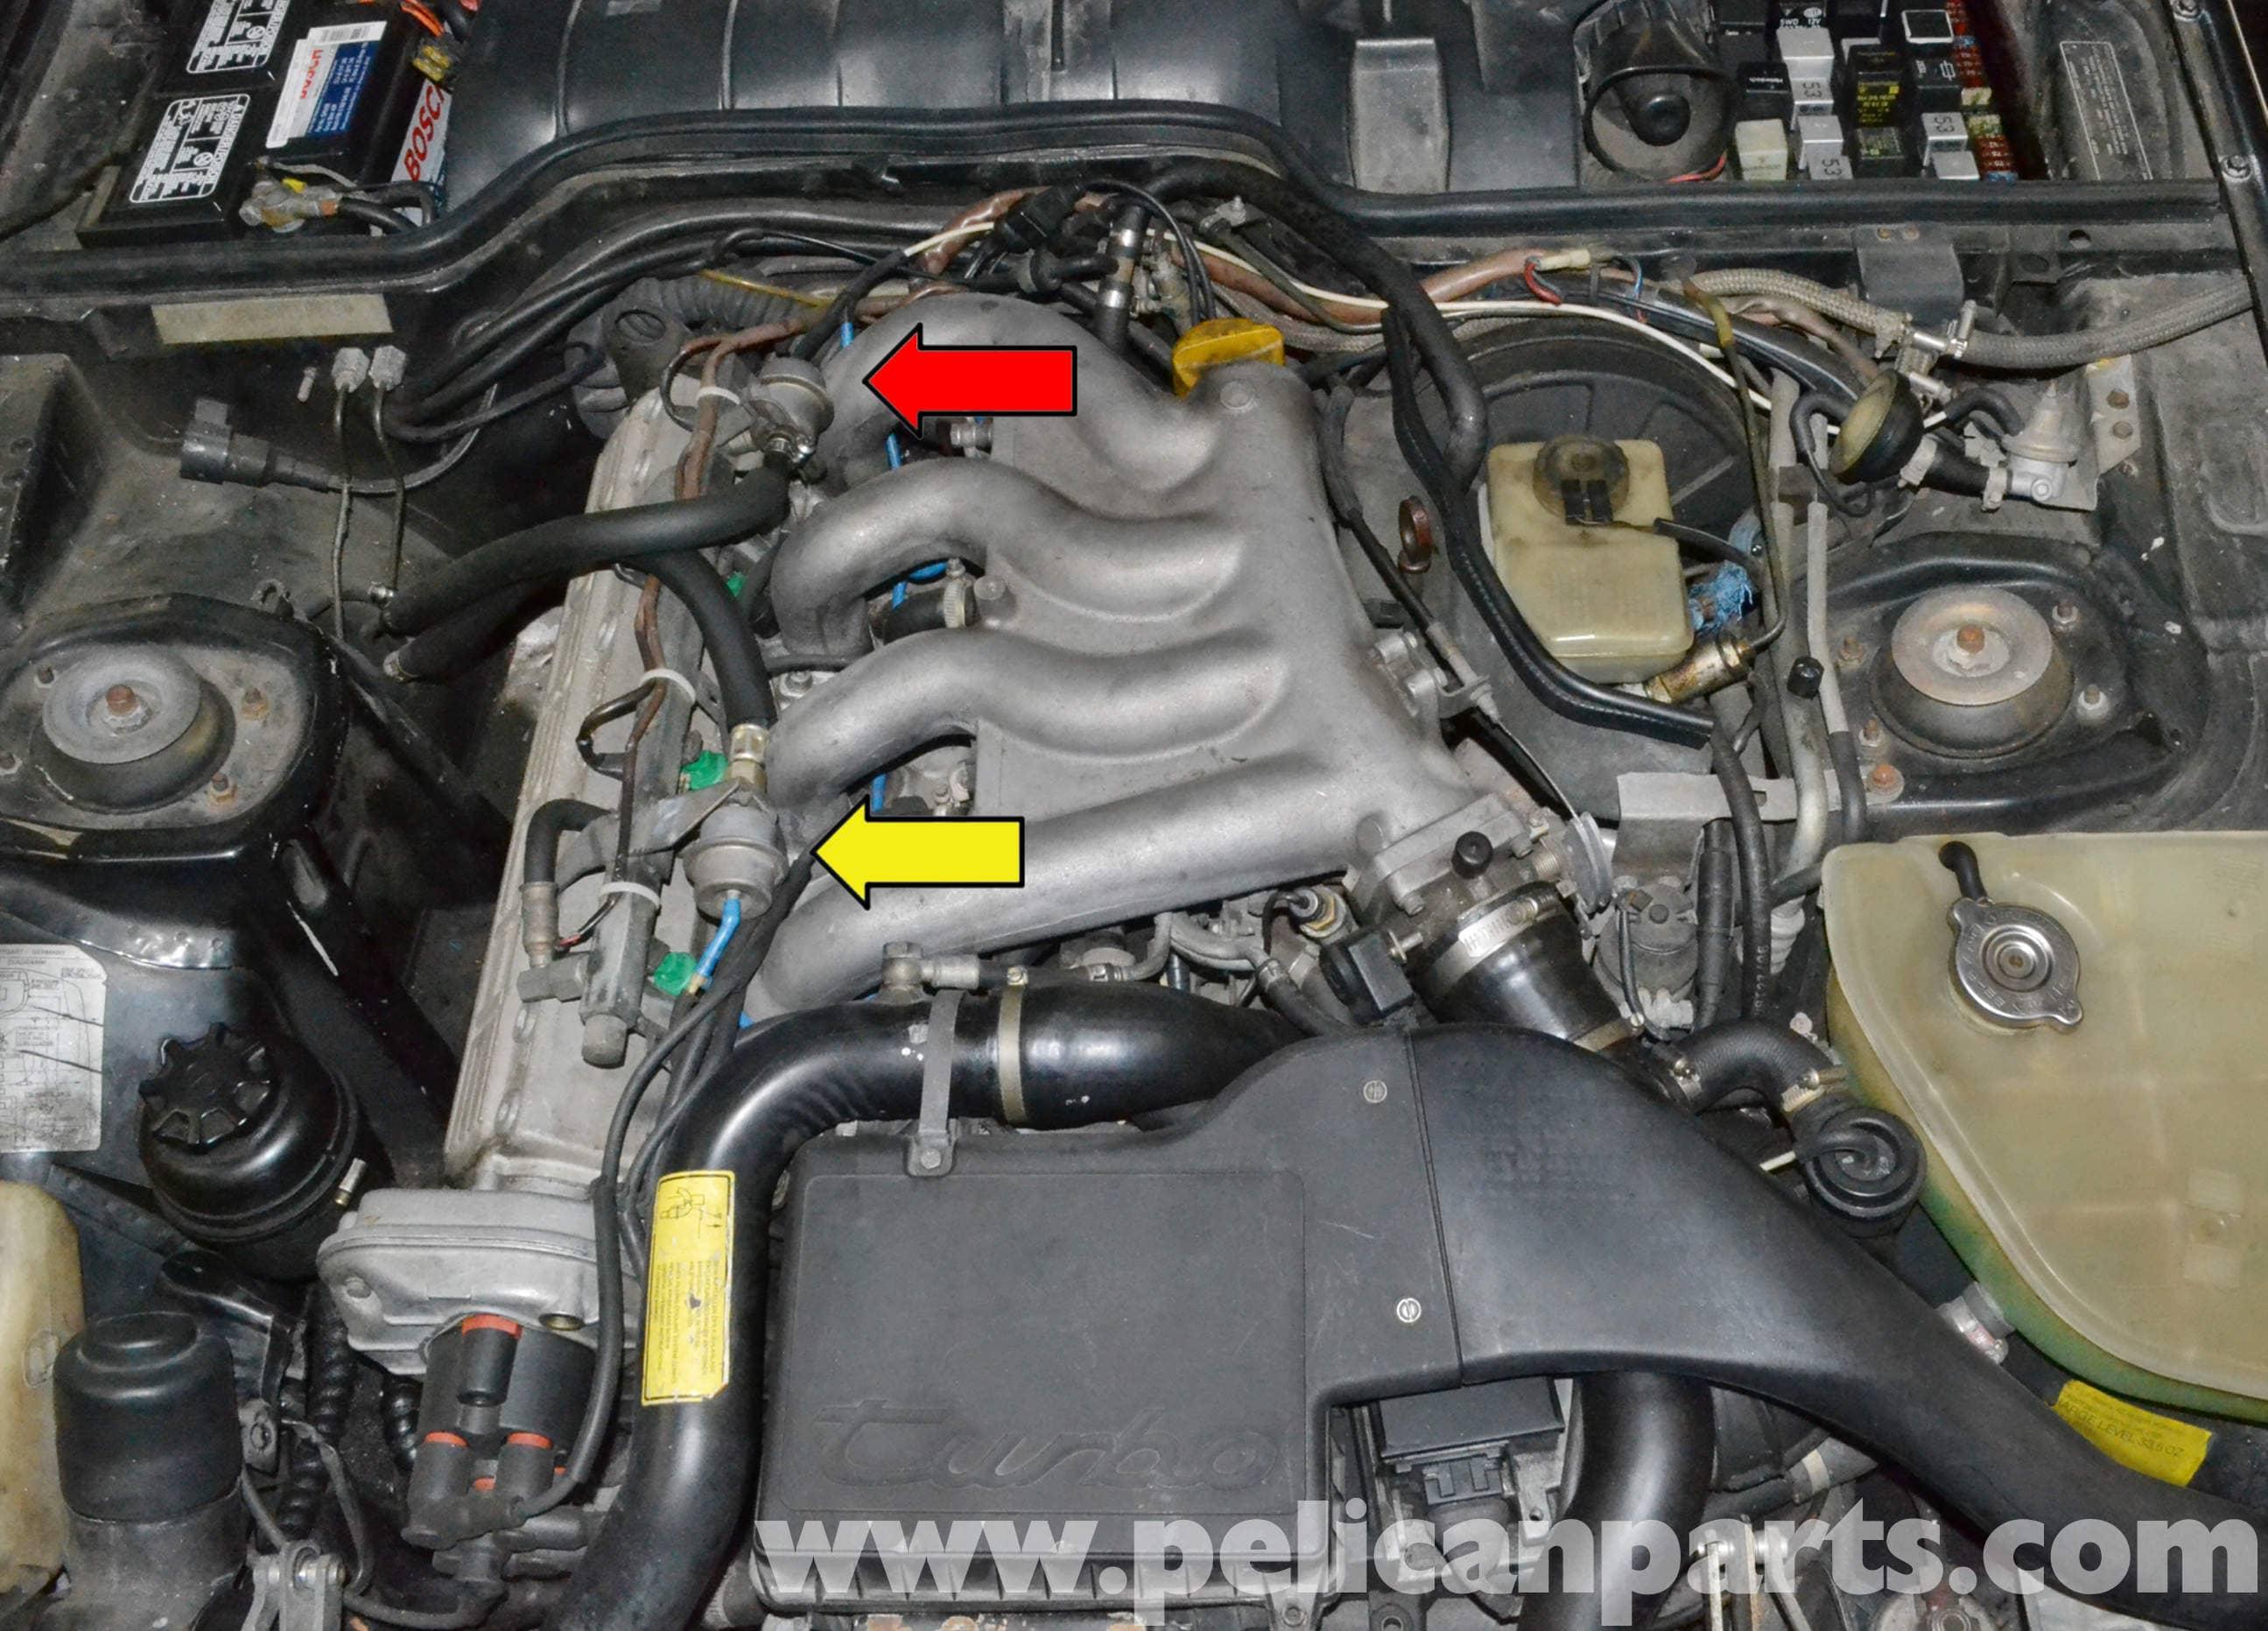 Porsche Fuel Pressure Diagram Wiring Diagrams Search